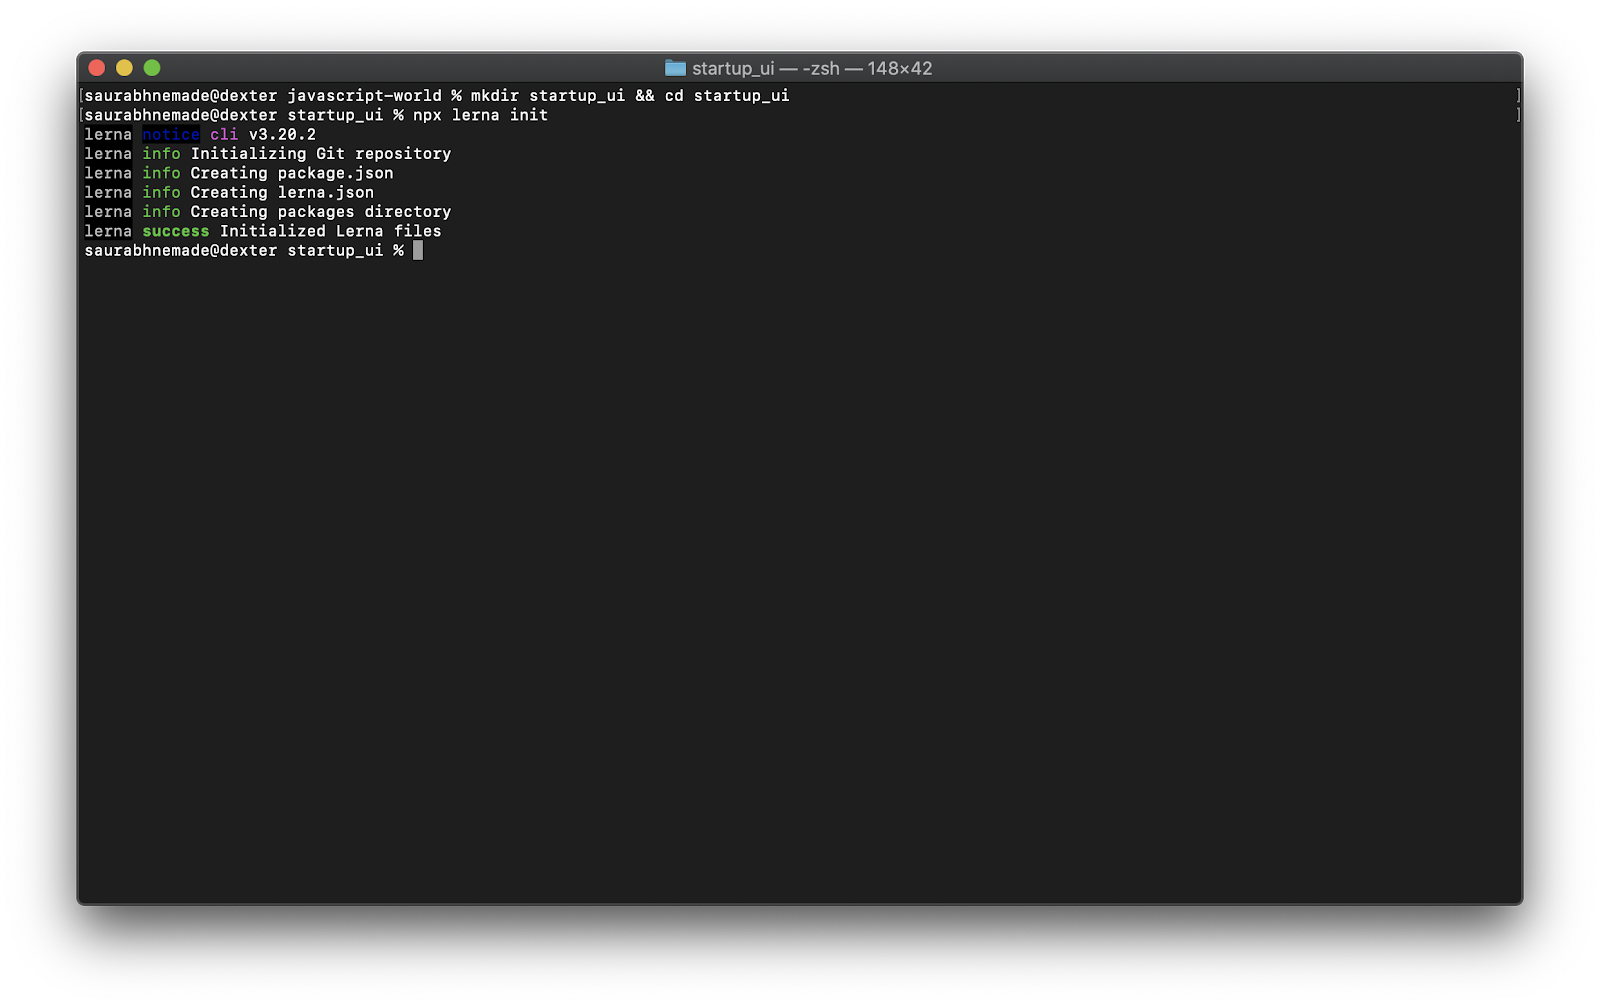 Lerna init output